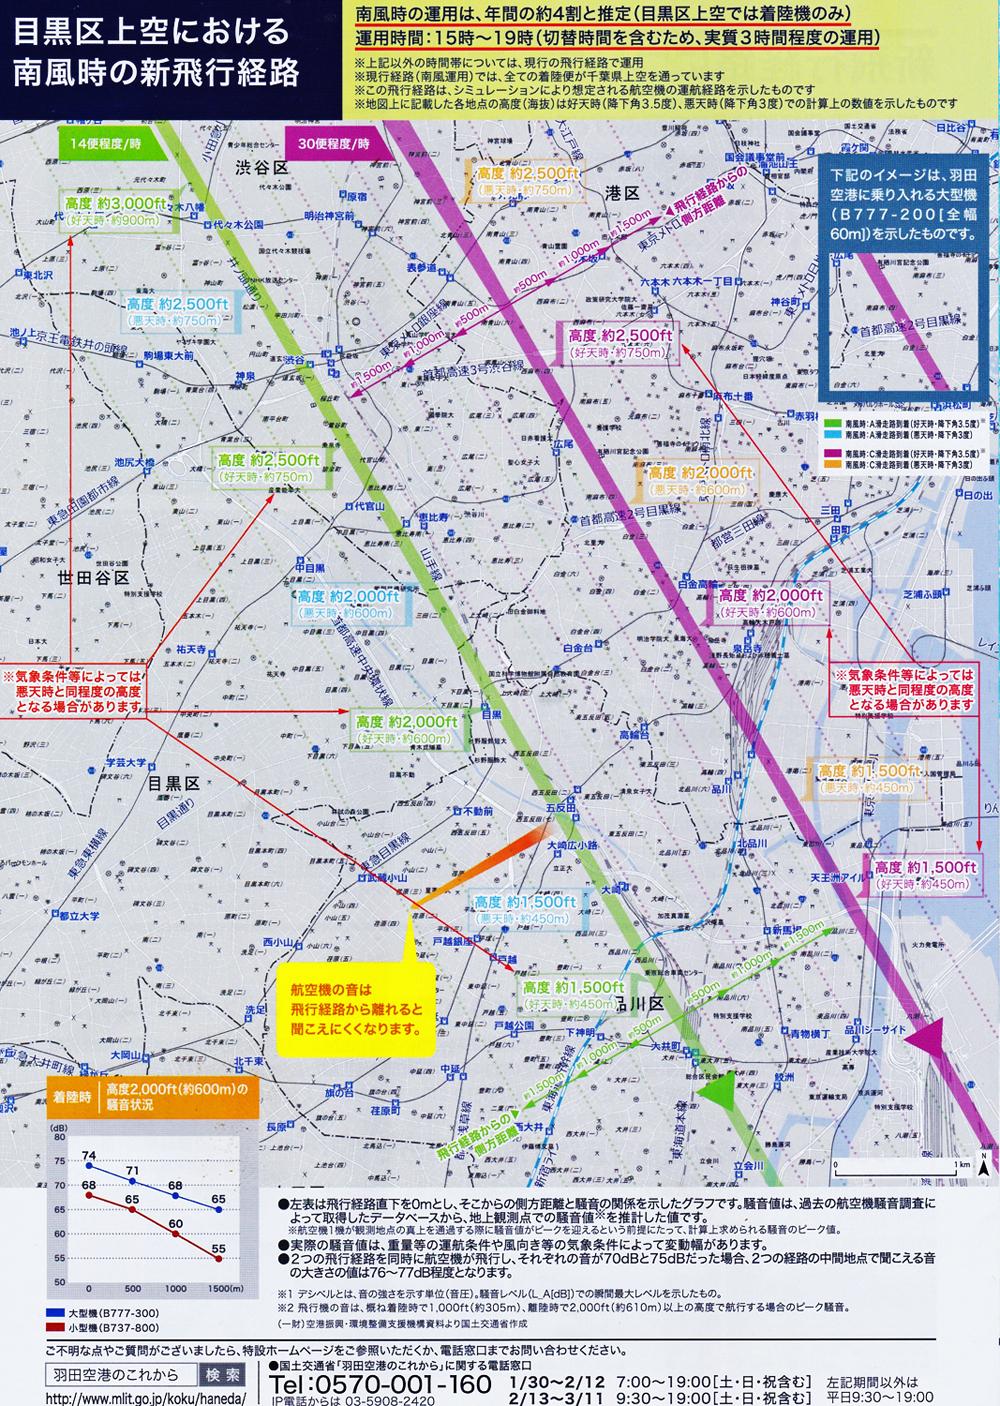 羽田空港 新着陸ルート